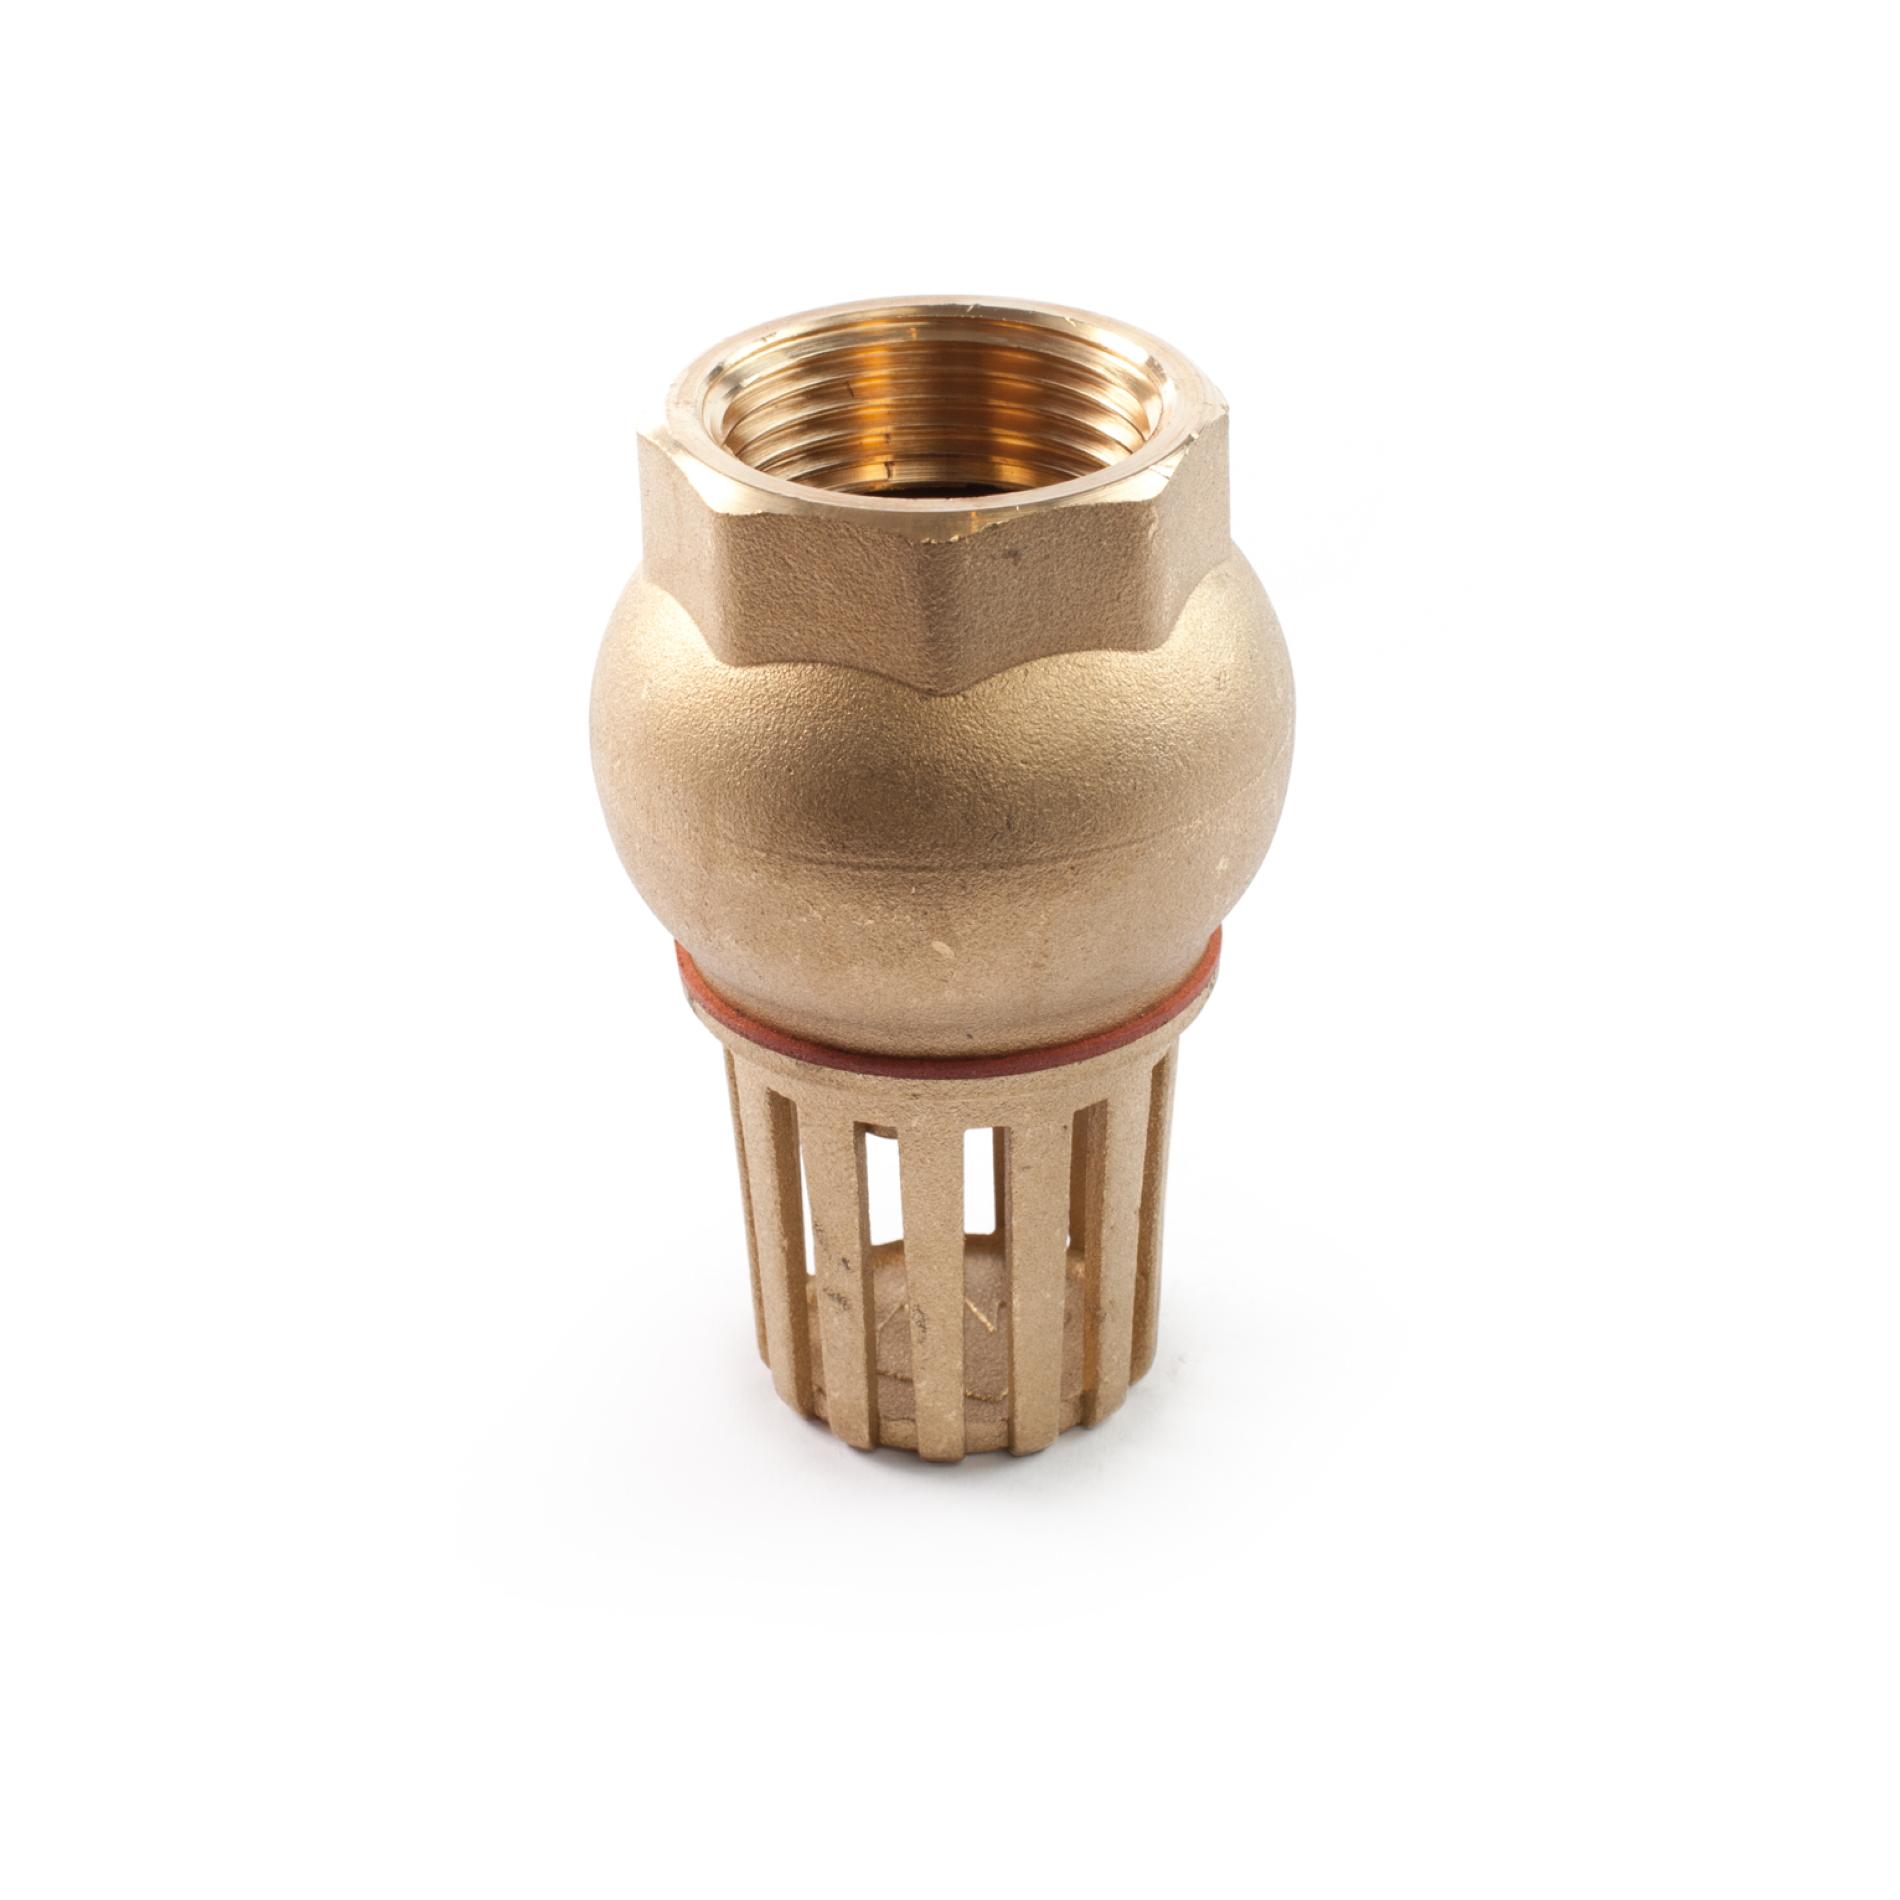 420 Valvola fondo filtro ottone Brass foot valve with strainer